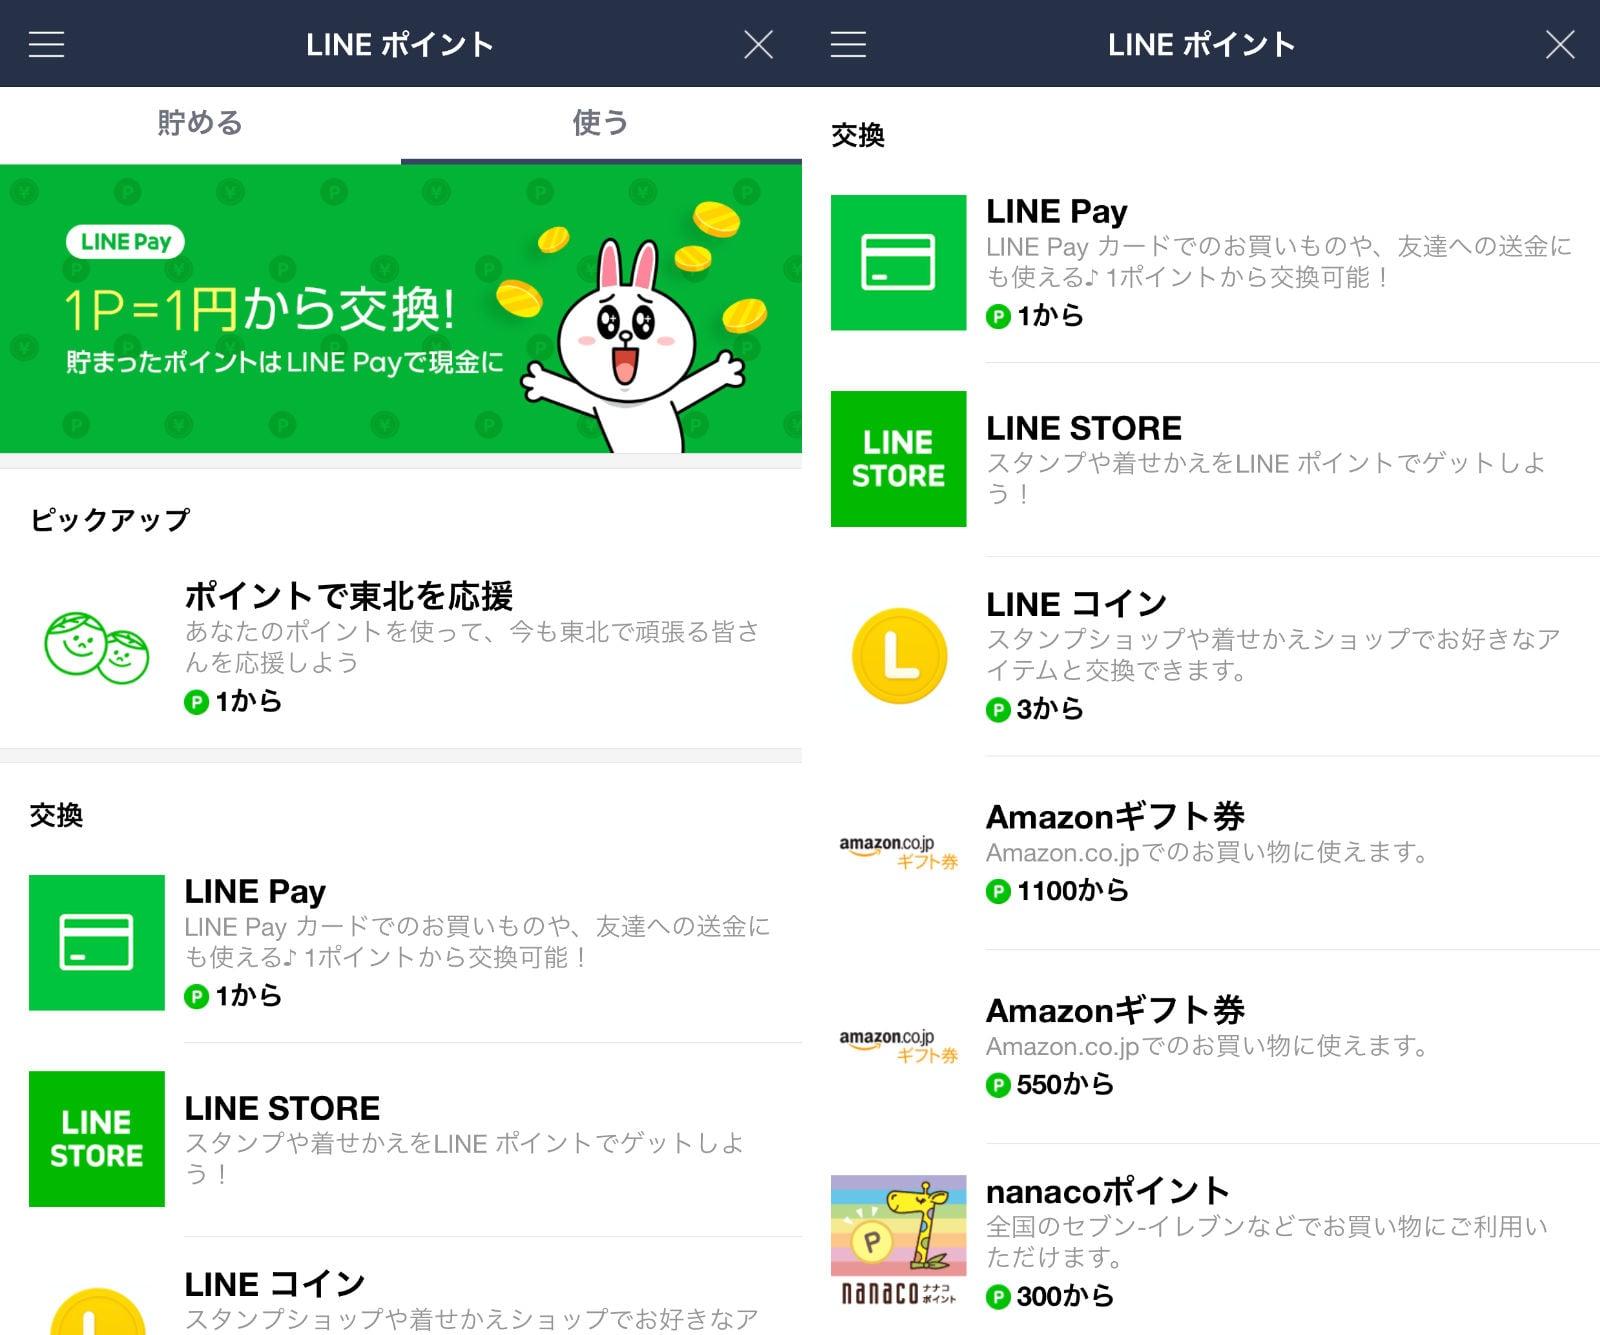 LINEPay Pointkoukan 01